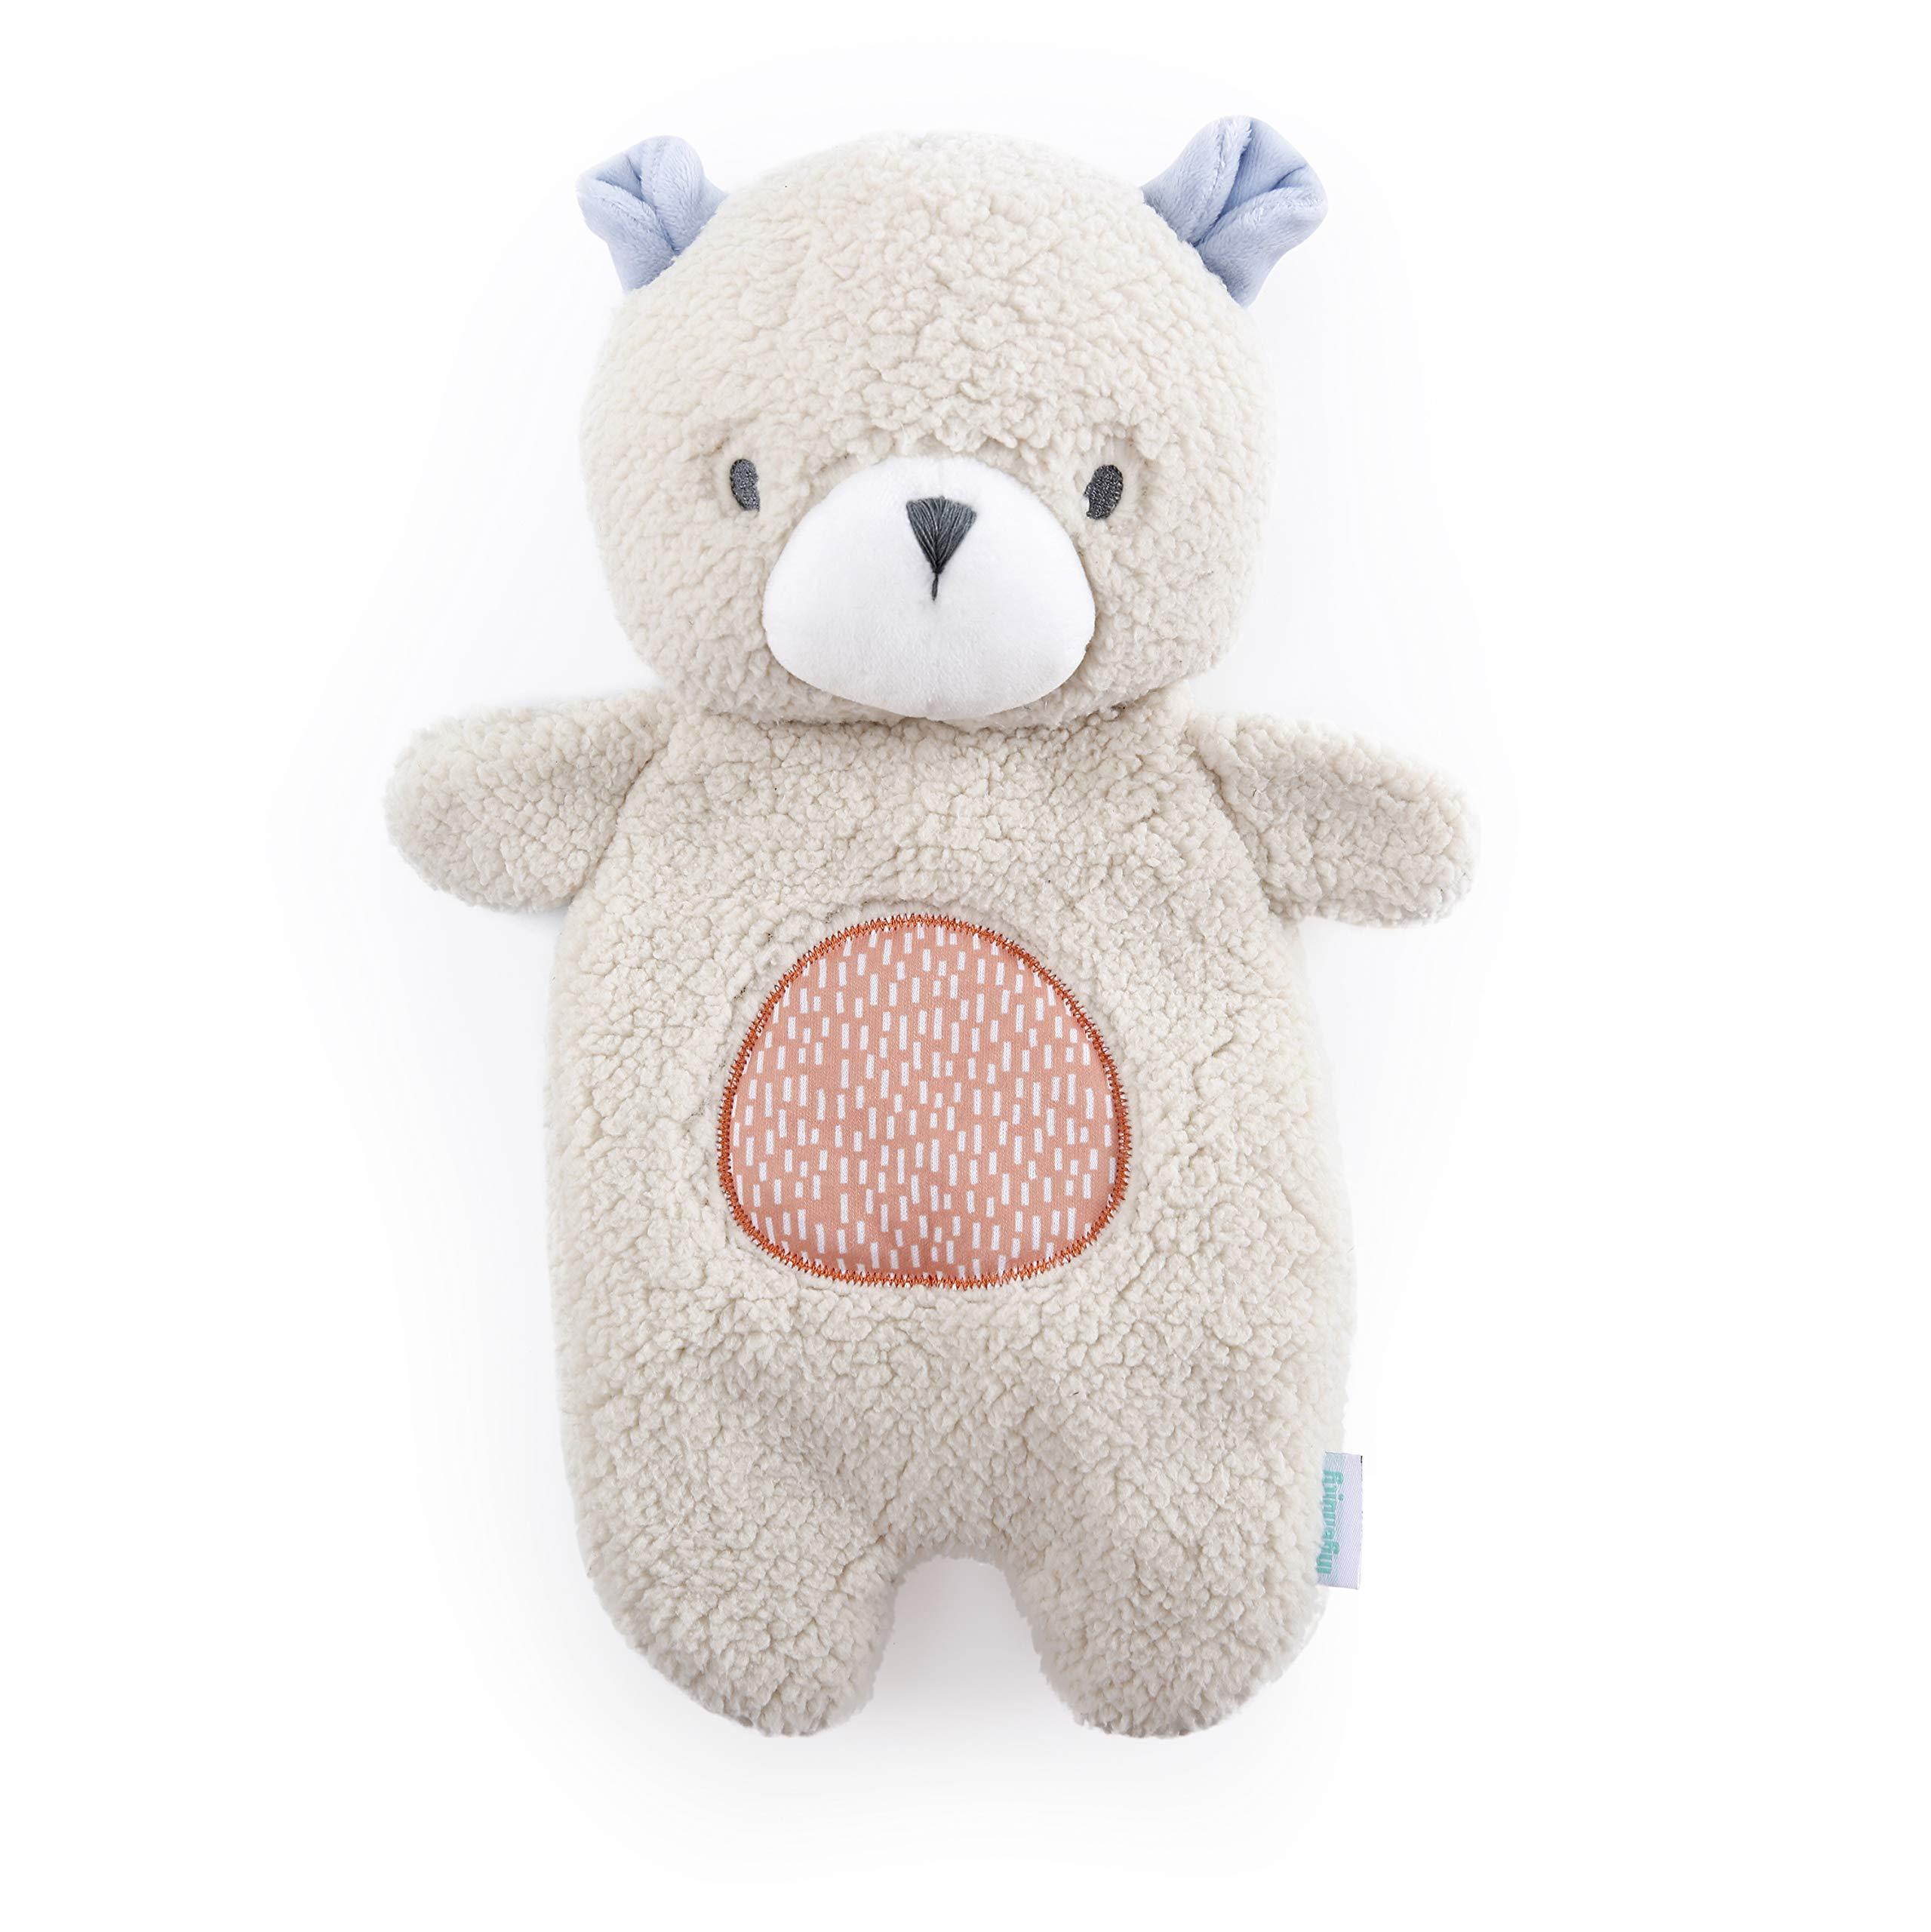 Ingenuity Premium Soft Plush Soothing Bean Bag Lovey - Nate The Teddy Bear, Ages Newborn +